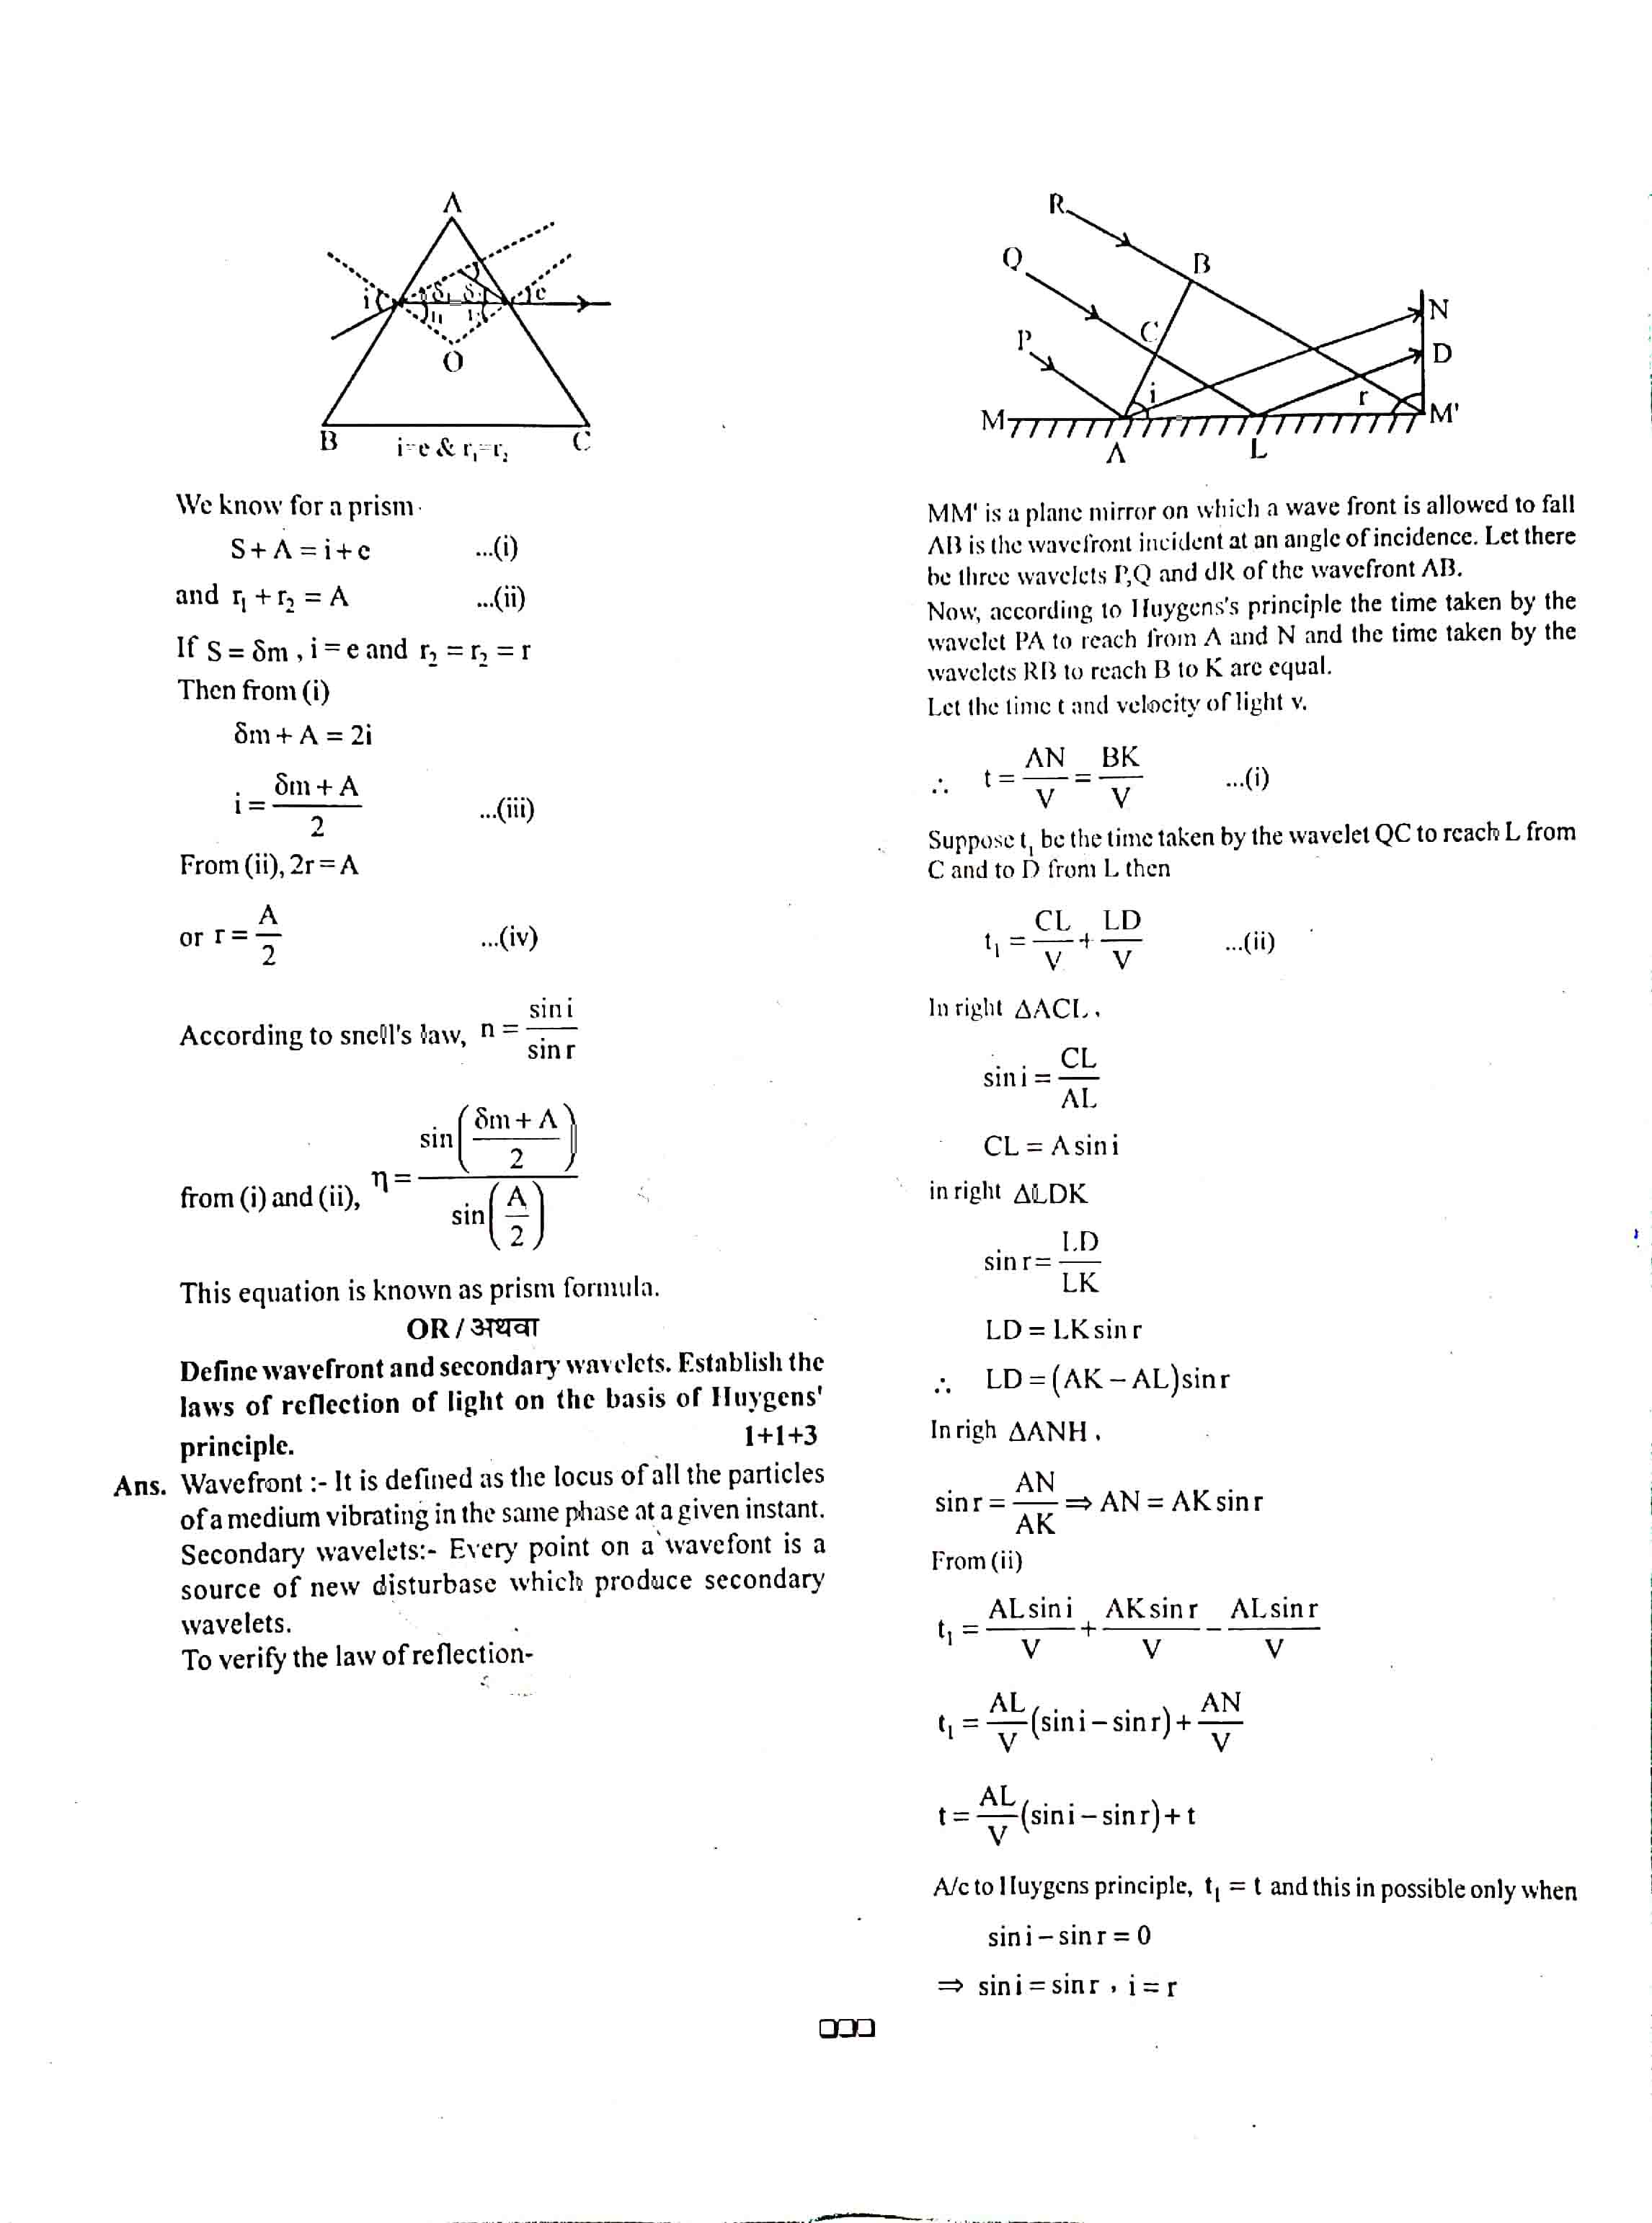 JAC Class 12 Physics 2019 Question Paper 08